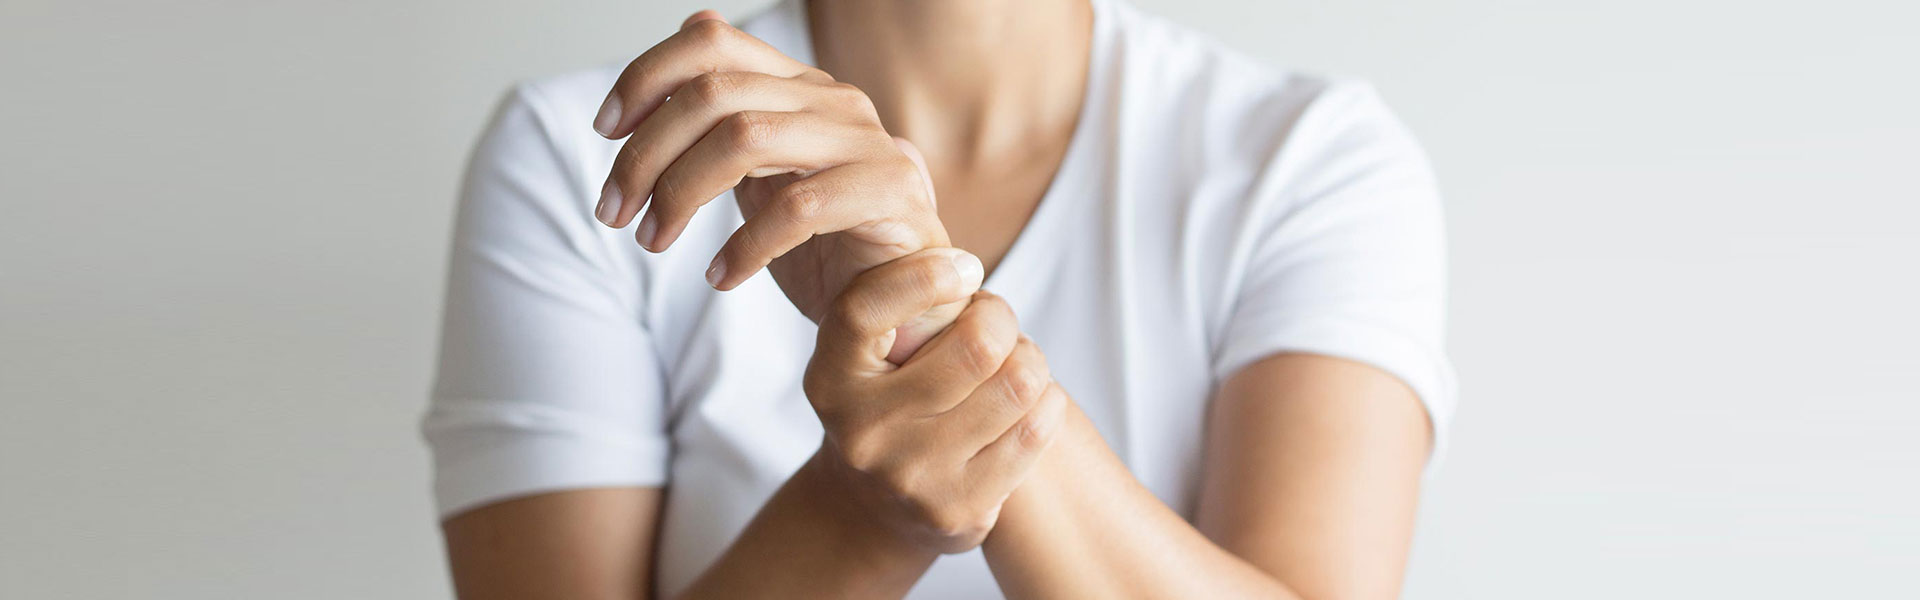 Orthobiologics-and-Joint-Preservation